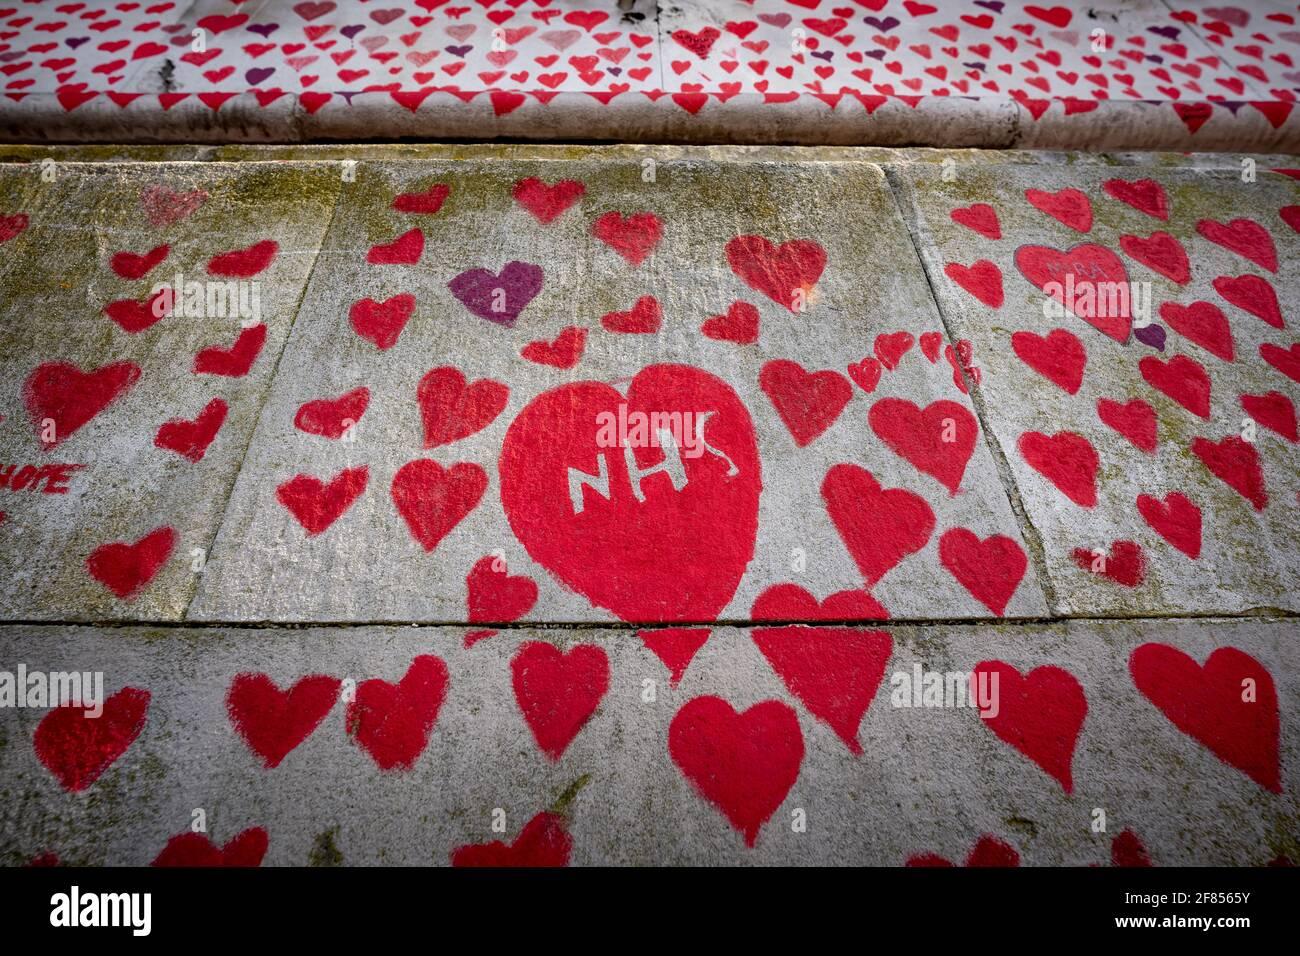 Coronavirus: National Covid Memorial Wall of Hearts, Westminster, London, UK. Stock Photo